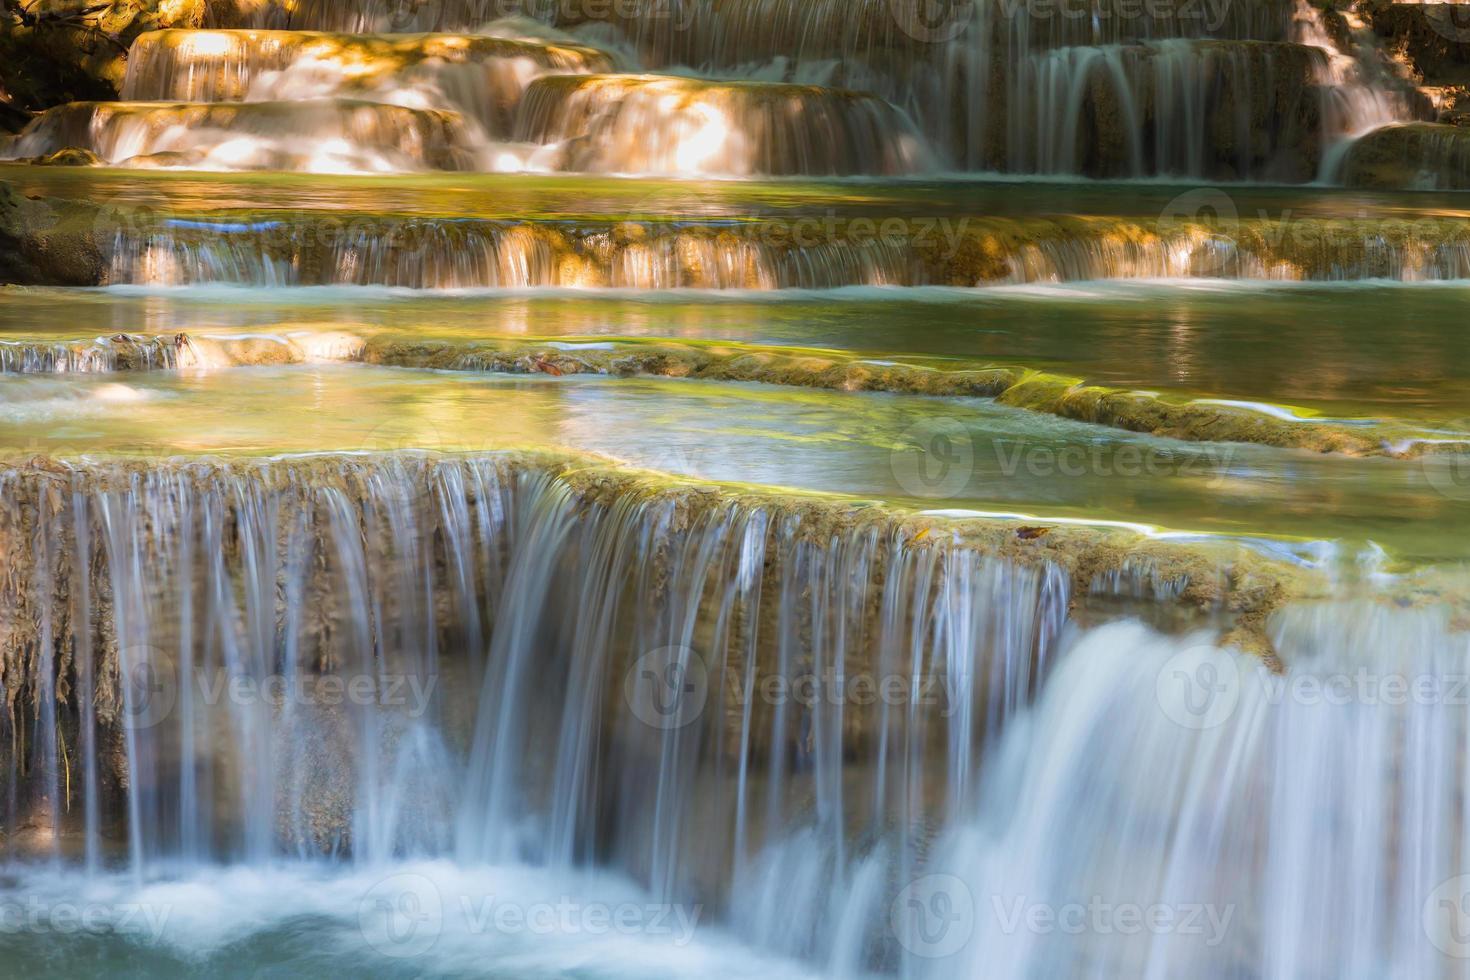 Wasserfälle geschlossen foto